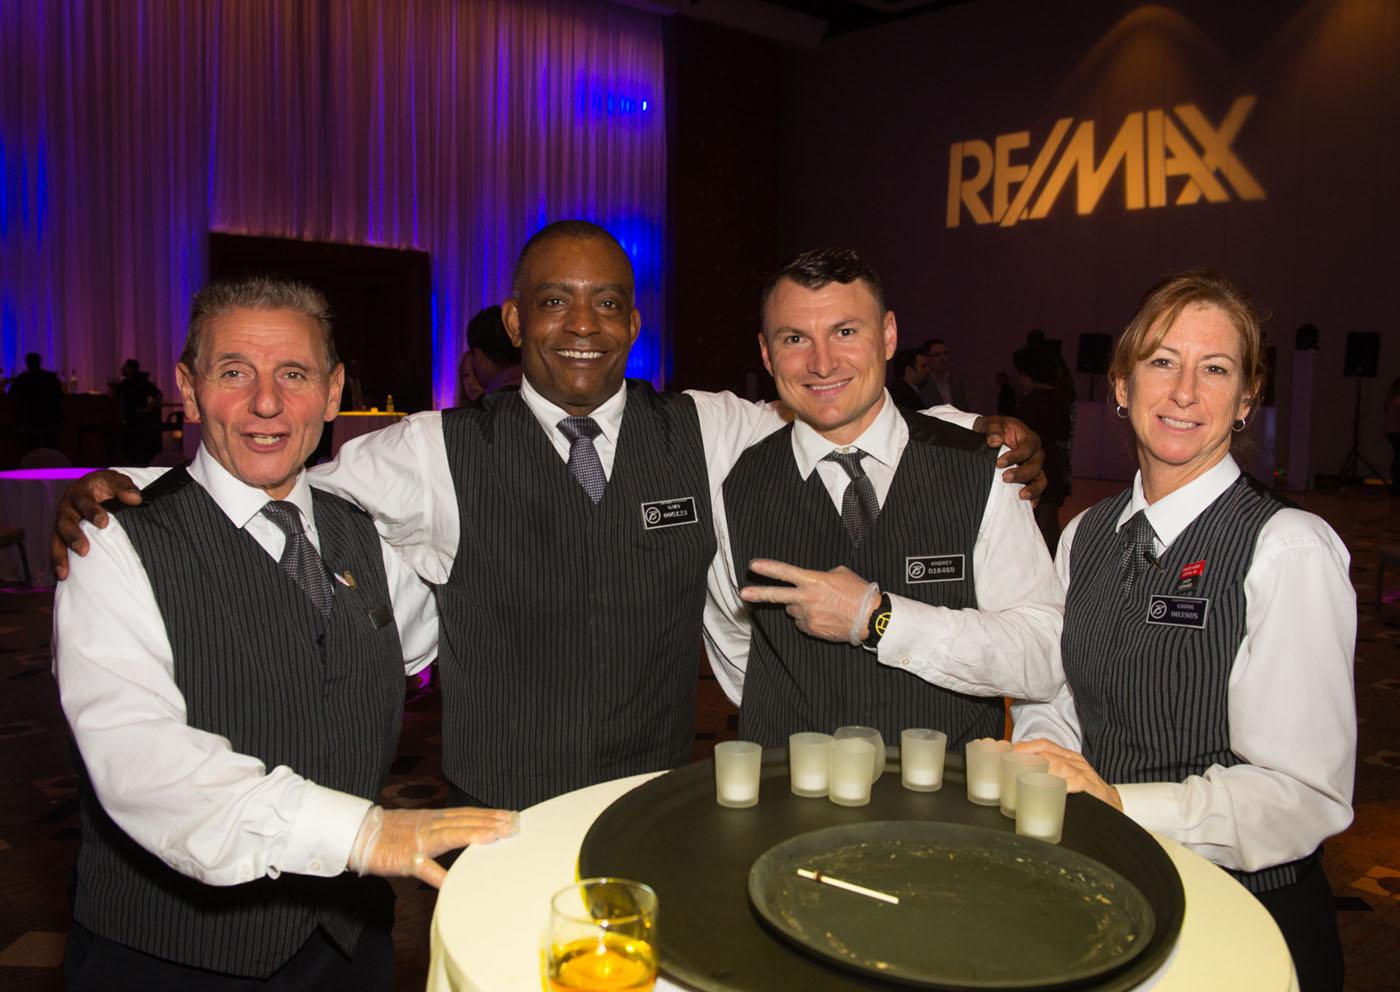 2015-12-09 ReMax Corpoarte Event - The Borgata - Atlantic City NJ - Photo Sesh - 2015-5383.jpg